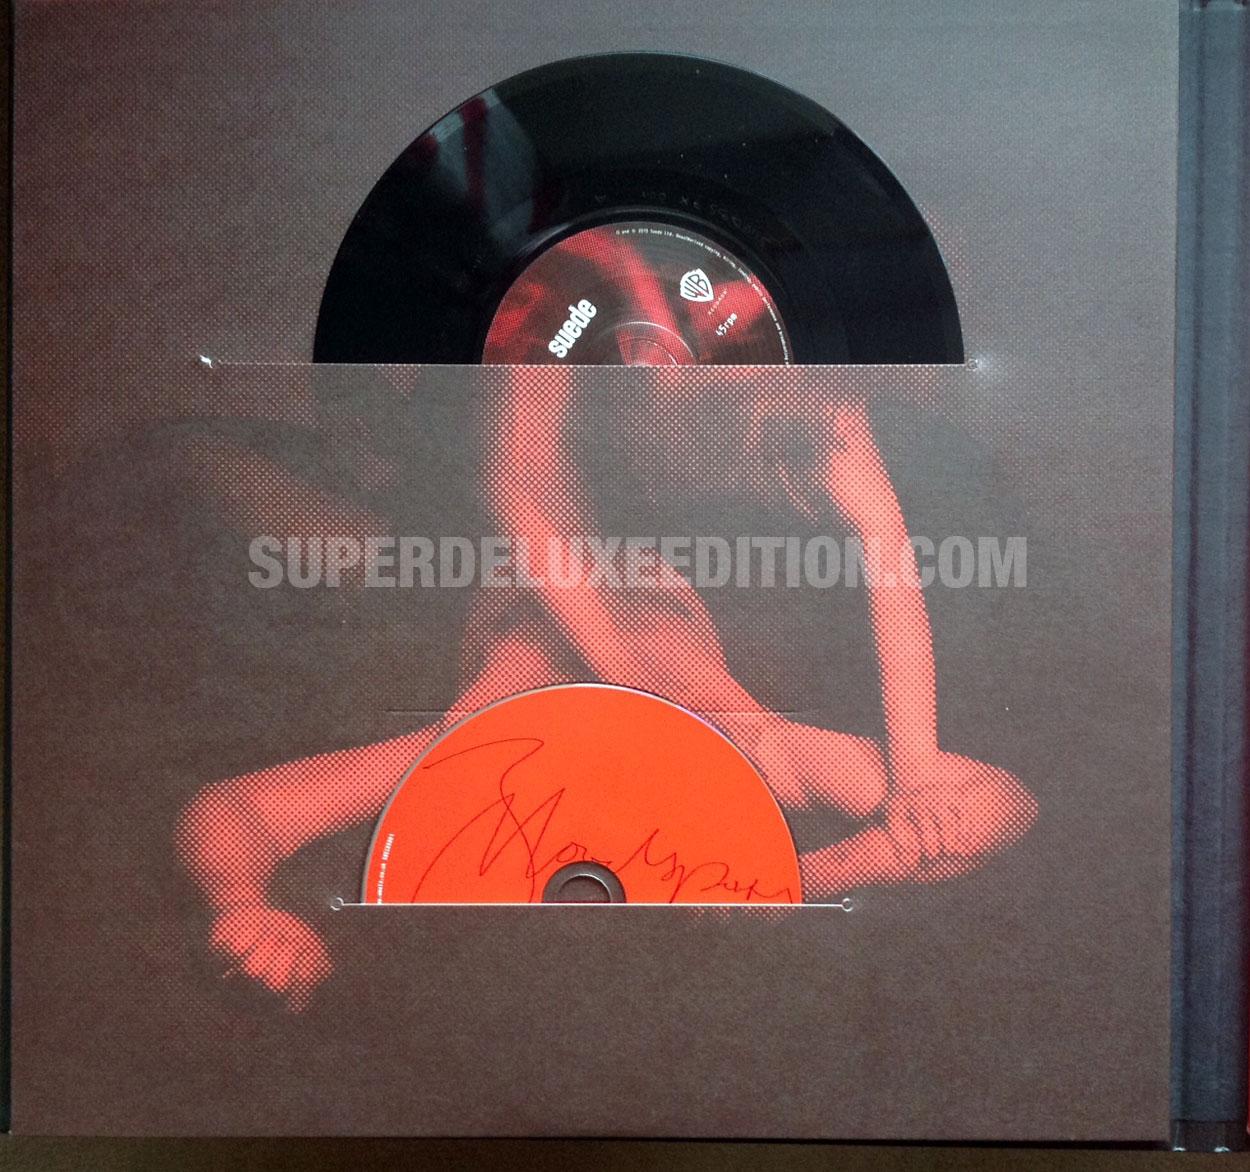 Suede / Bloodsports deluxe bundle vinyl